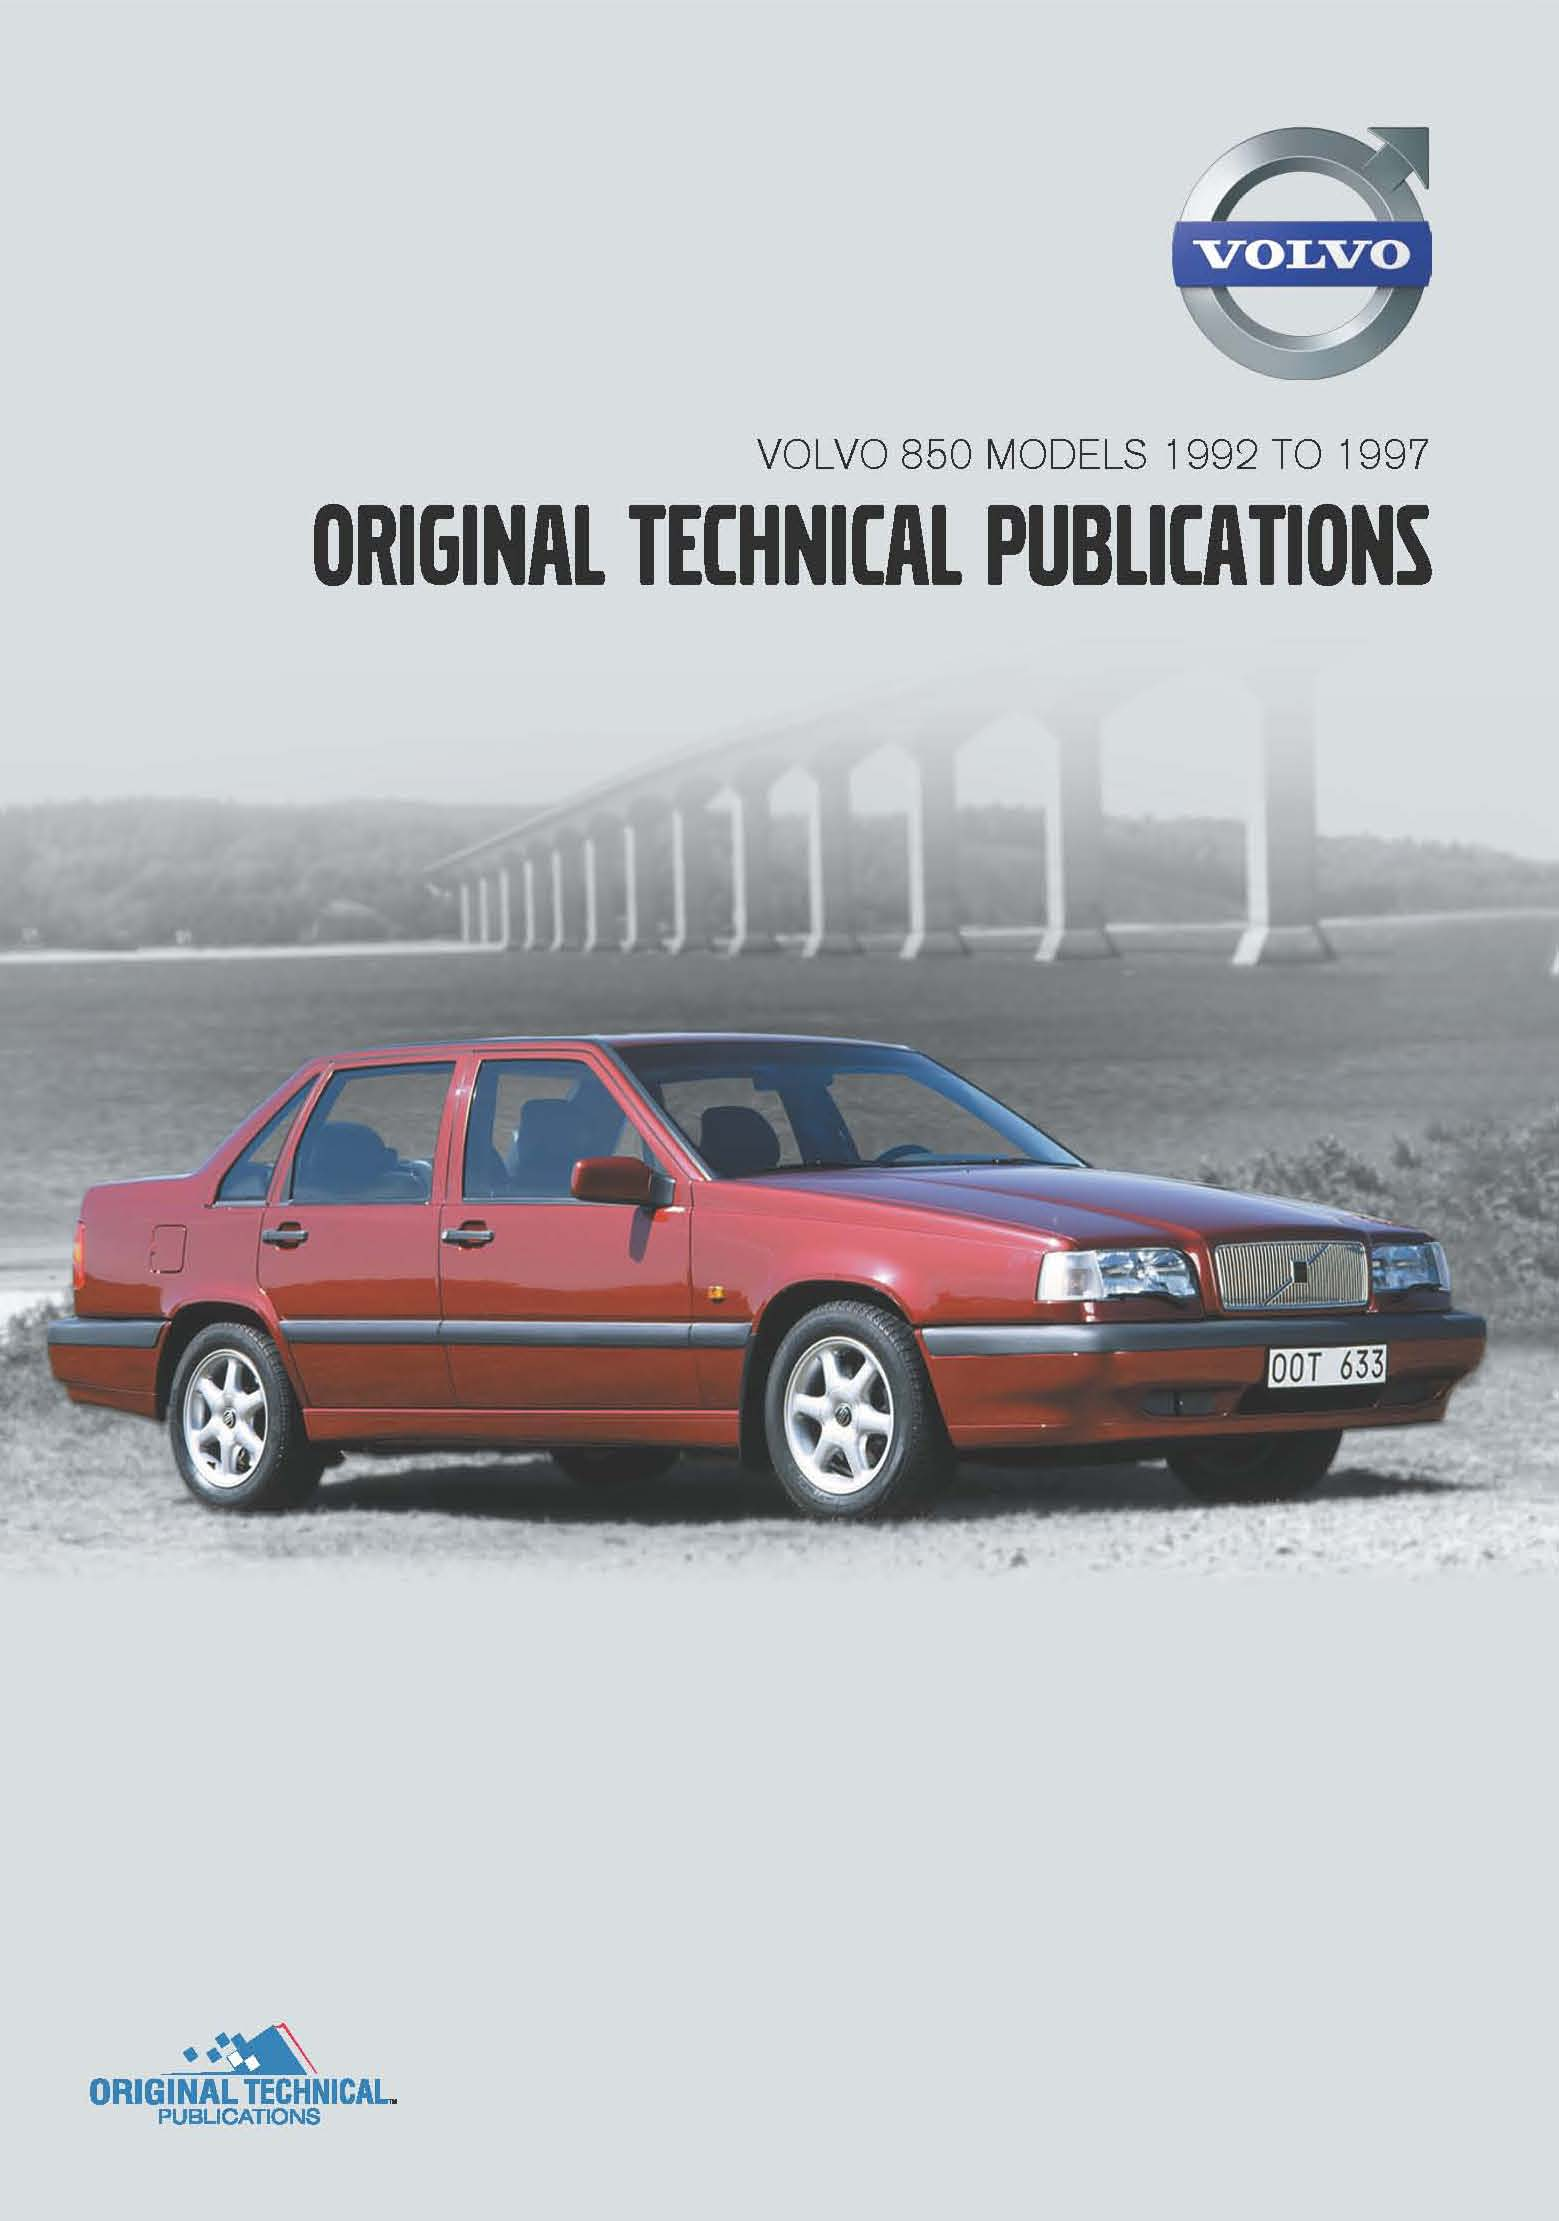 Volvo 850 Models 1992-1997